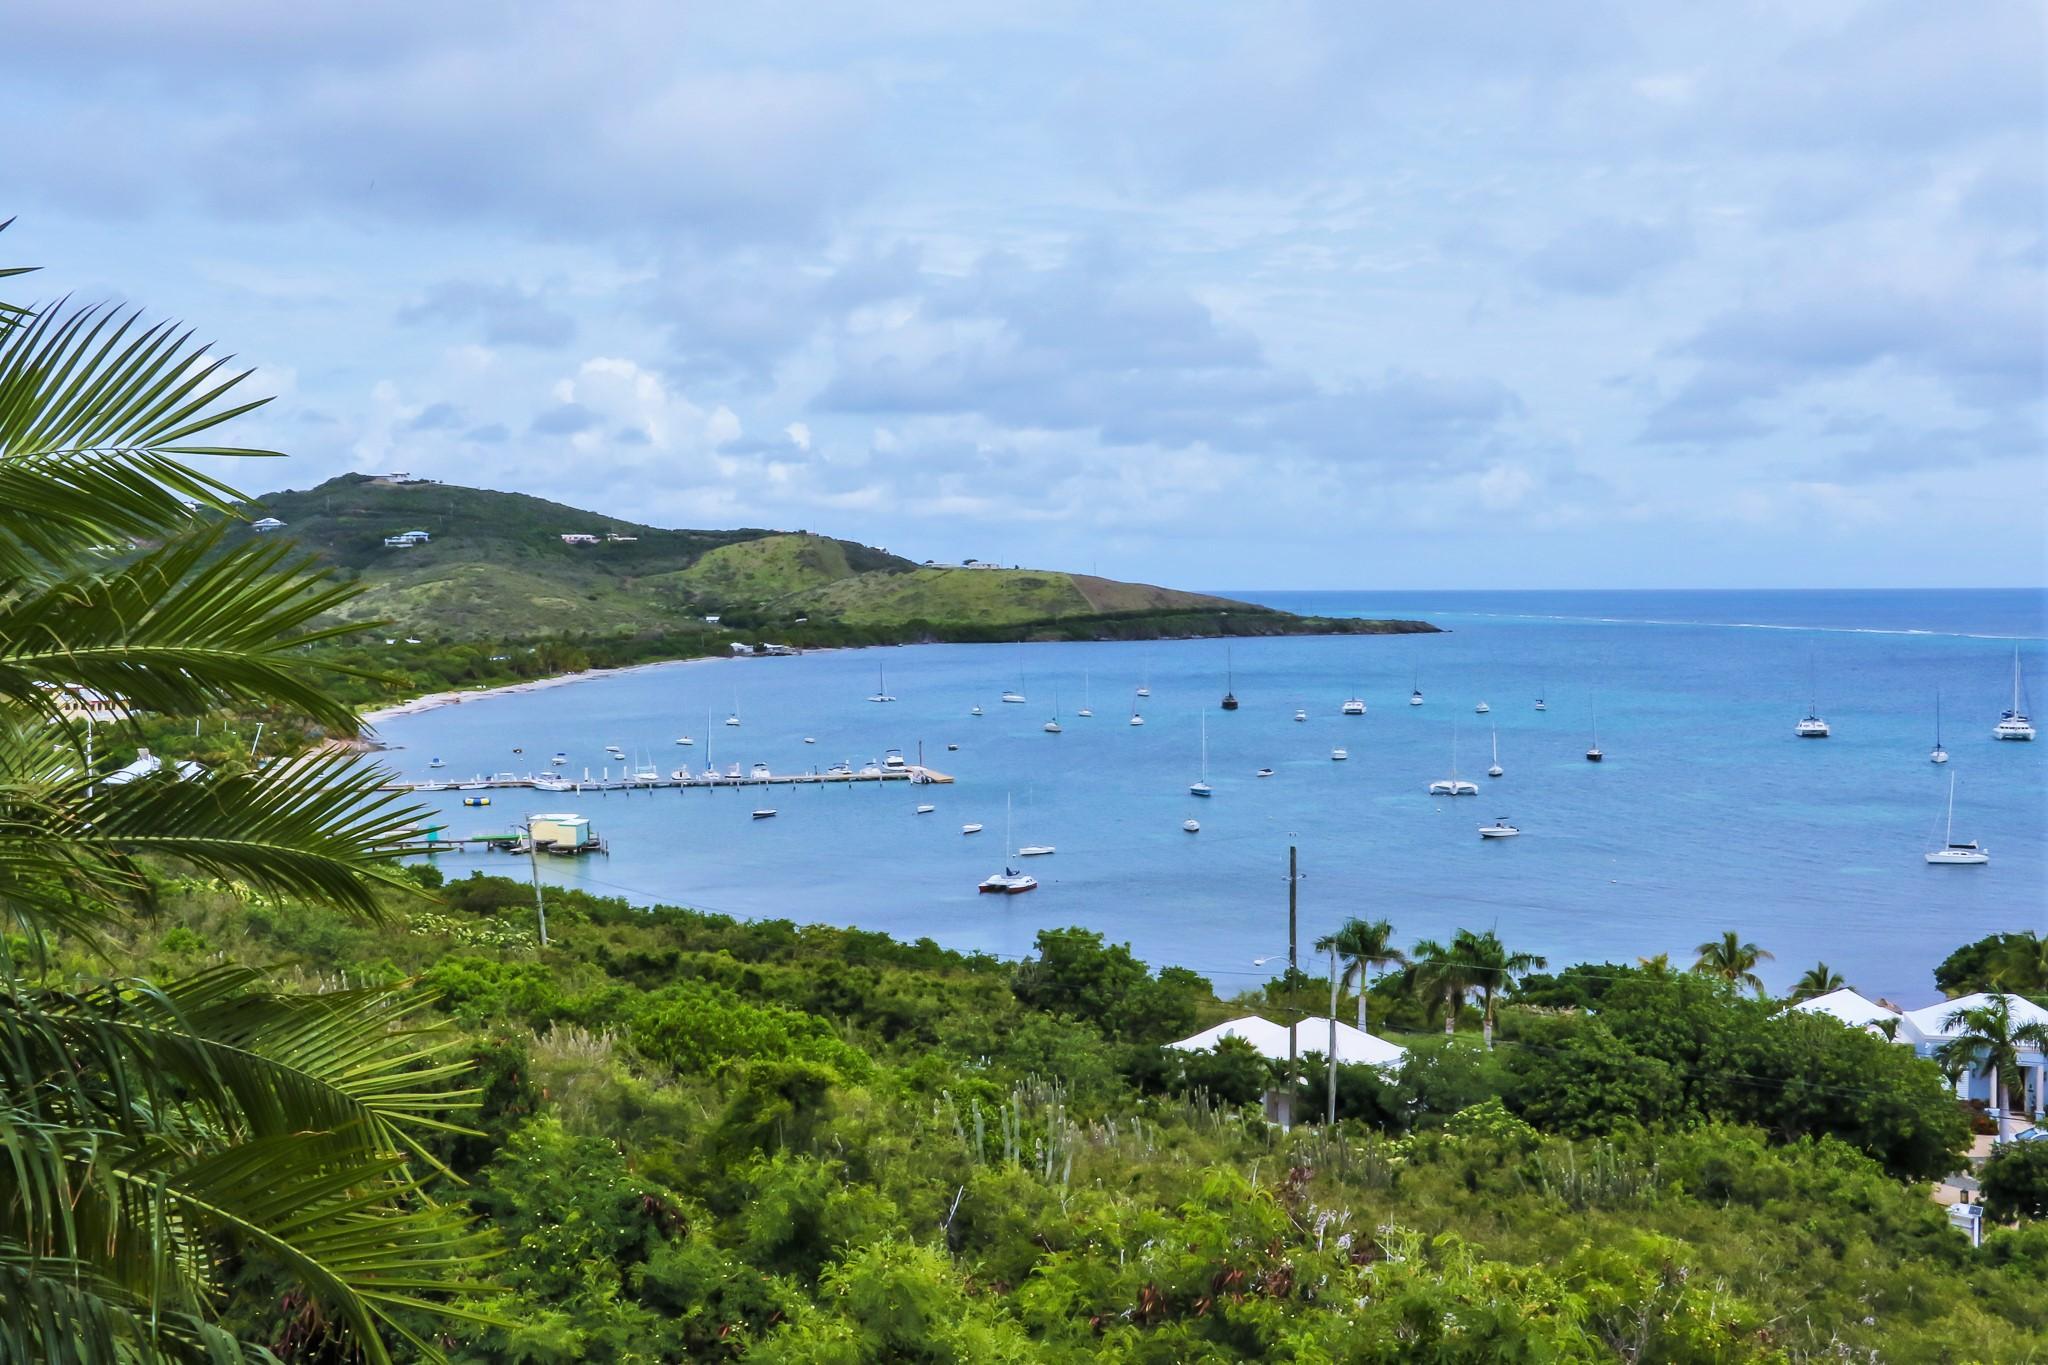 Yacht Club and Island Views